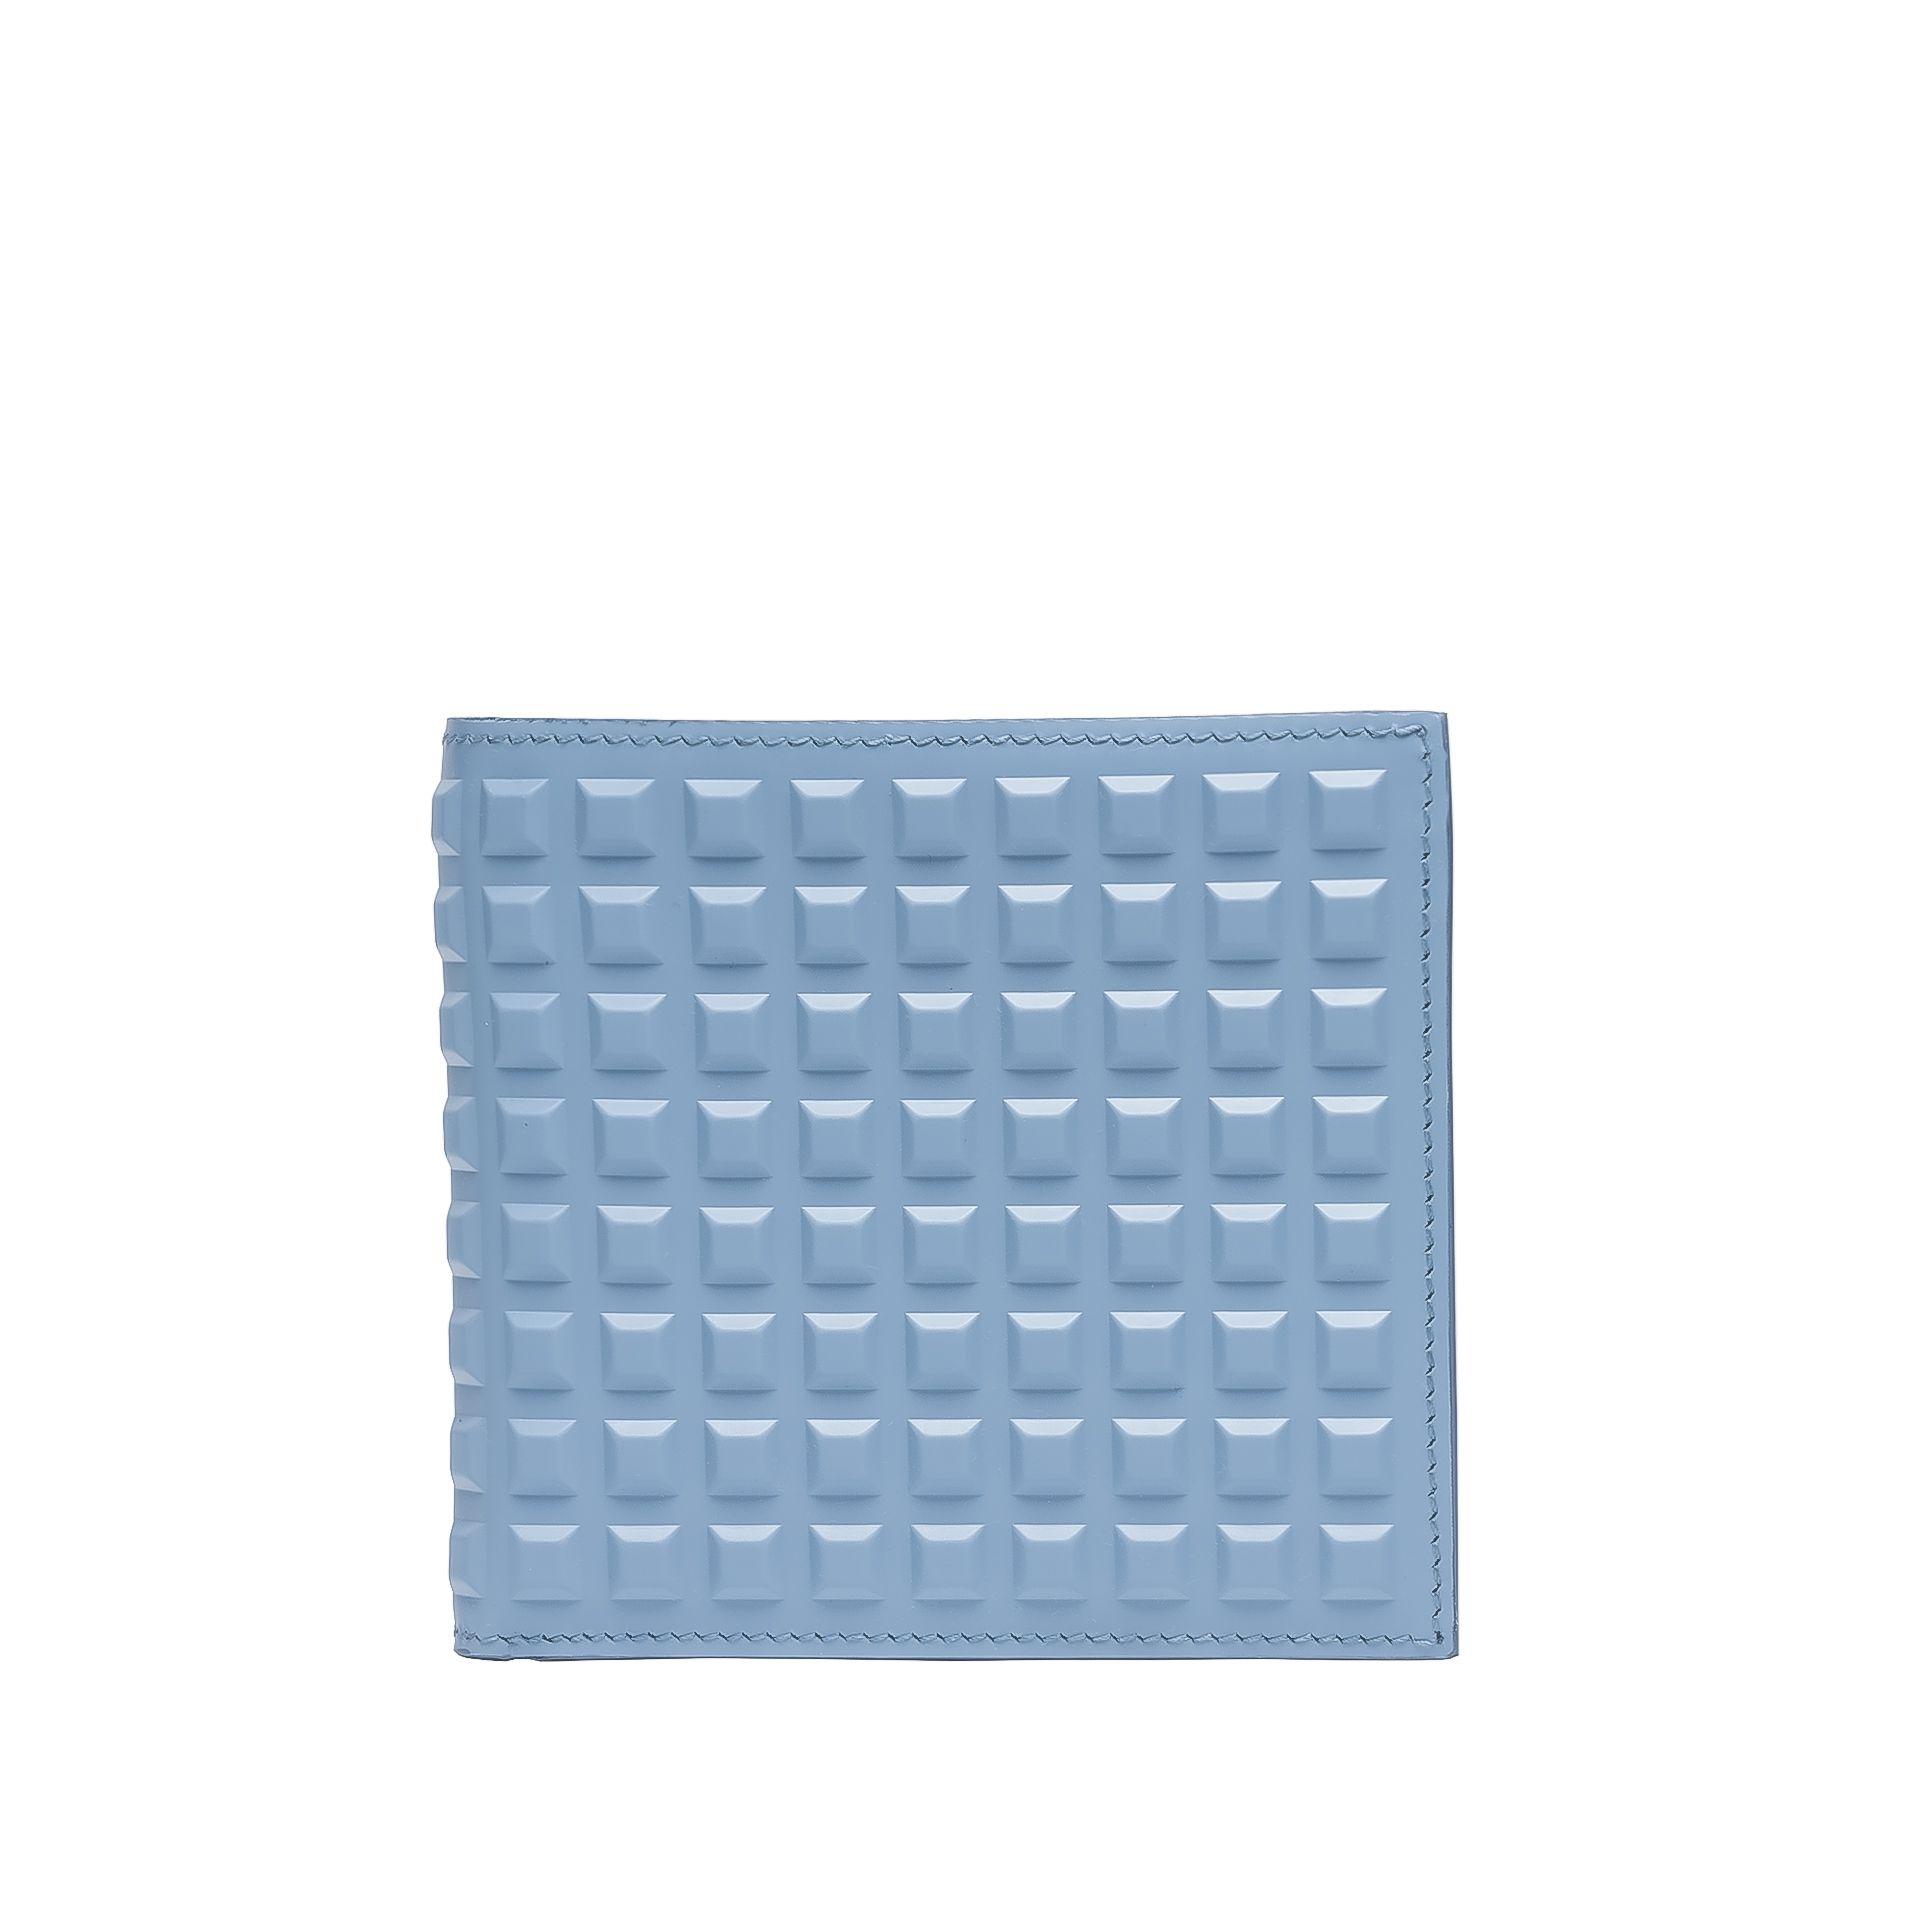 Balenciaga Square Wallet Grid